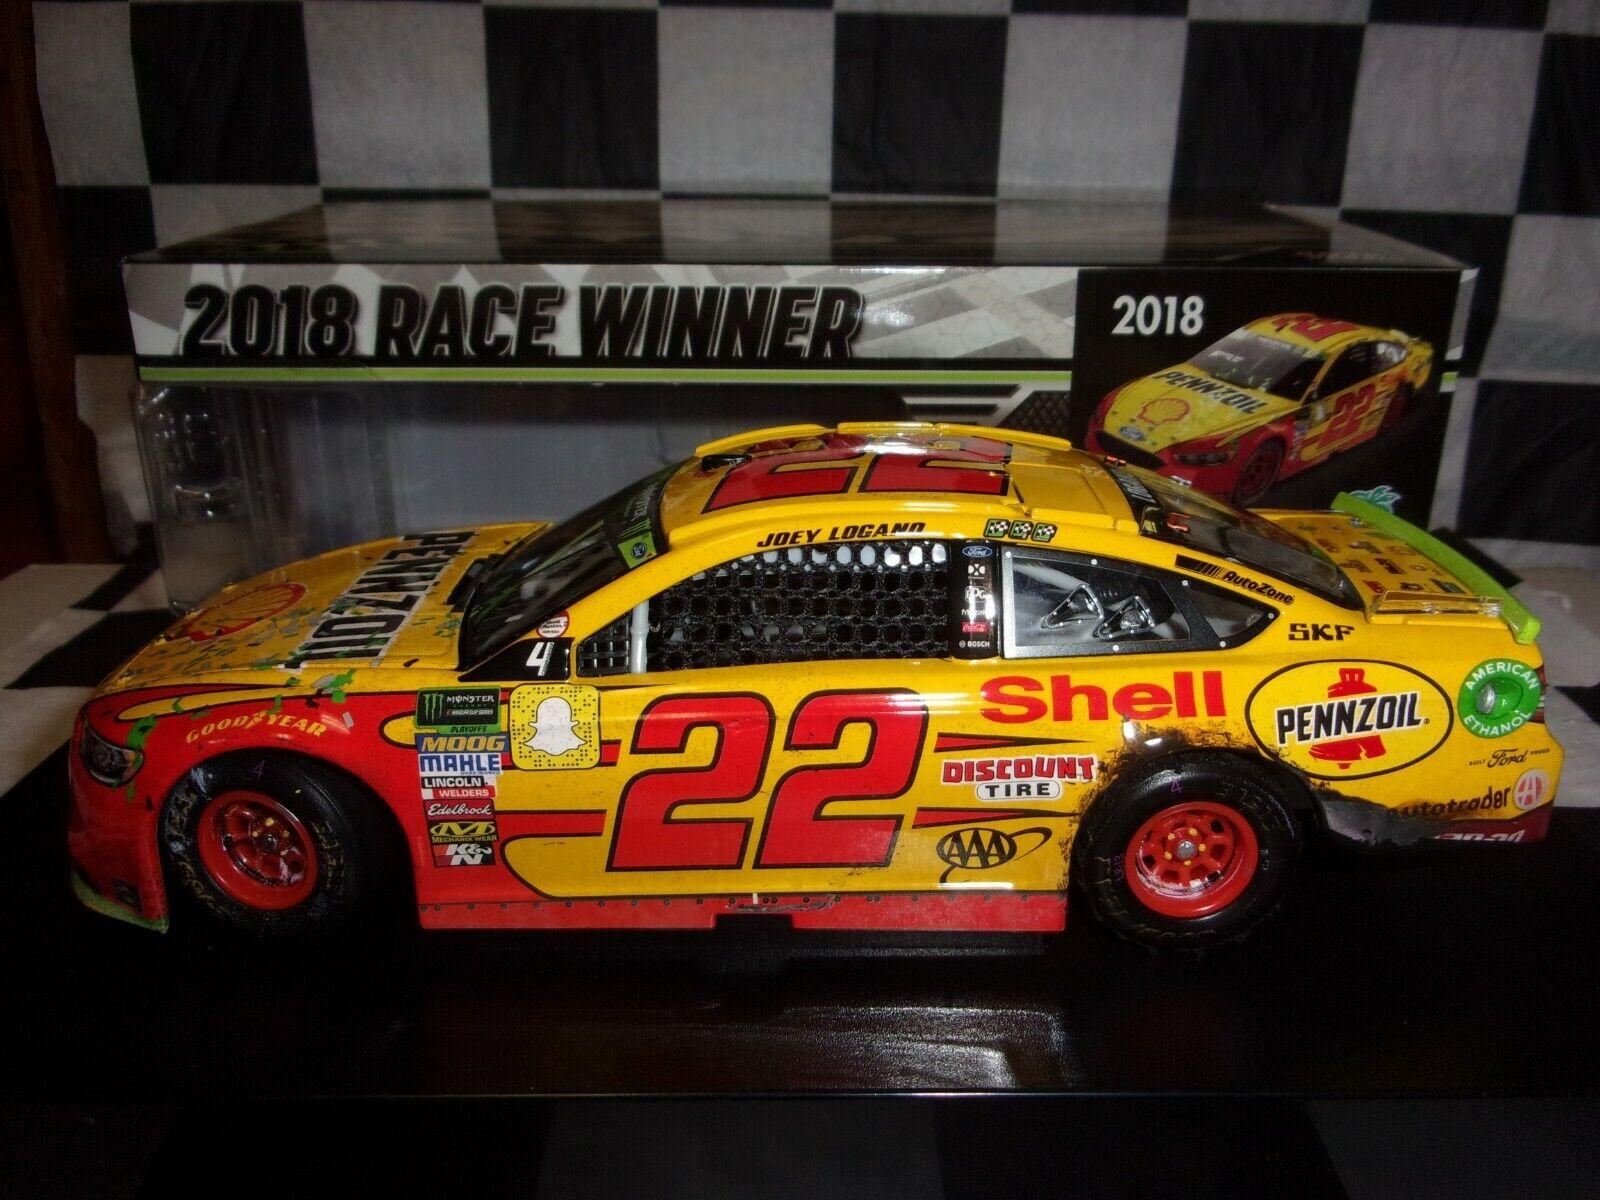 Joey Logano  22 Shell Pennzoil Homestead Win 2018 Fusion 1 24 scale car NASCAR